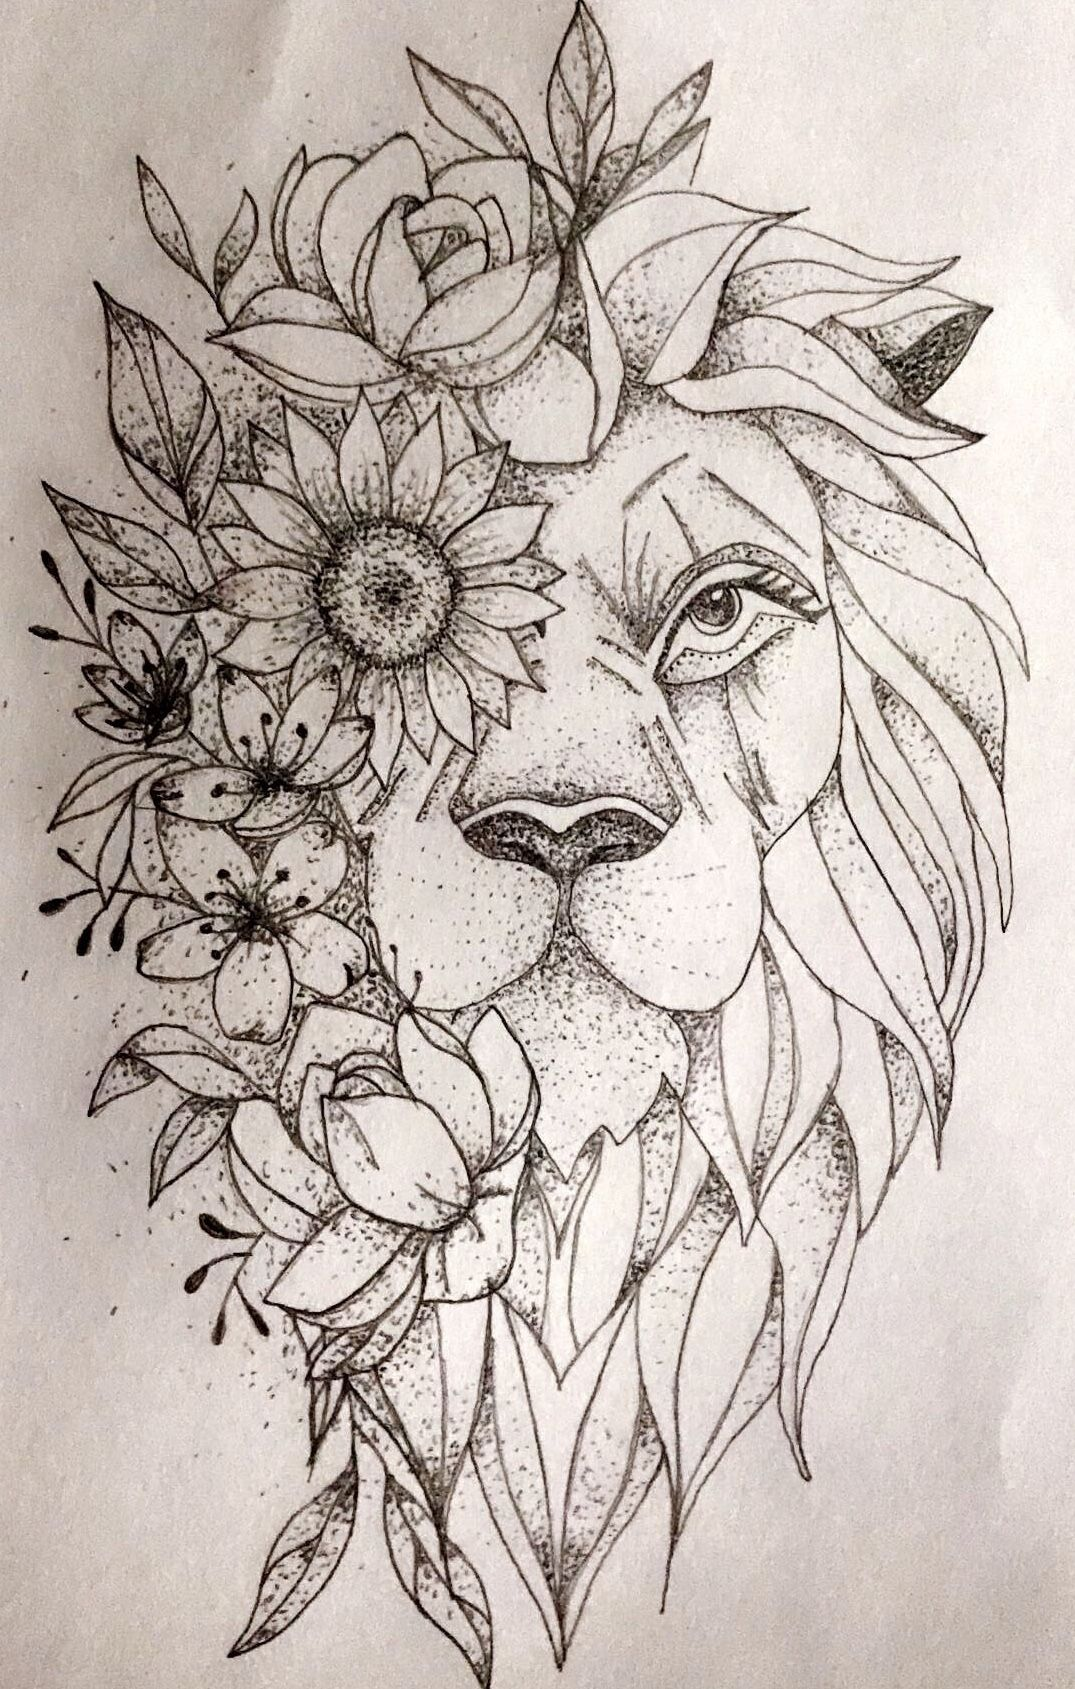 Tattoo Drawing Bloem Leeuw In 2020 Simple Lion Tattoo Lion Tattoo Lion Tattoo Design